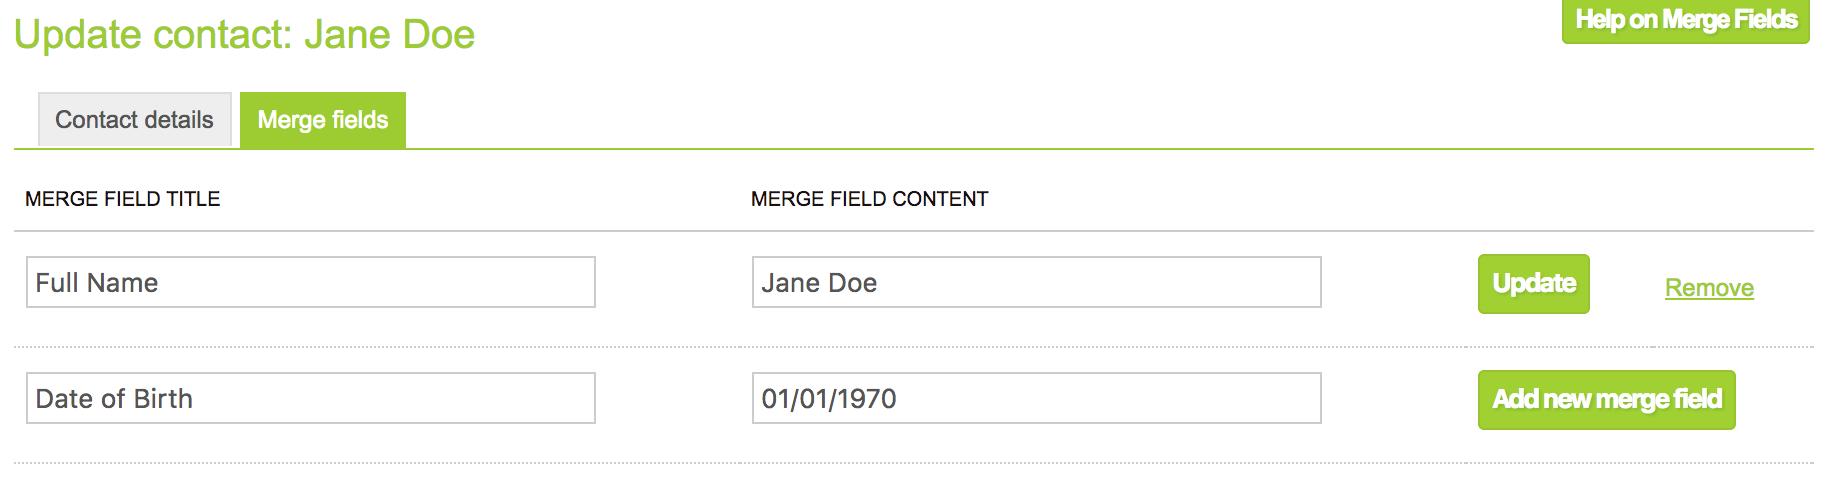 merge fields 3